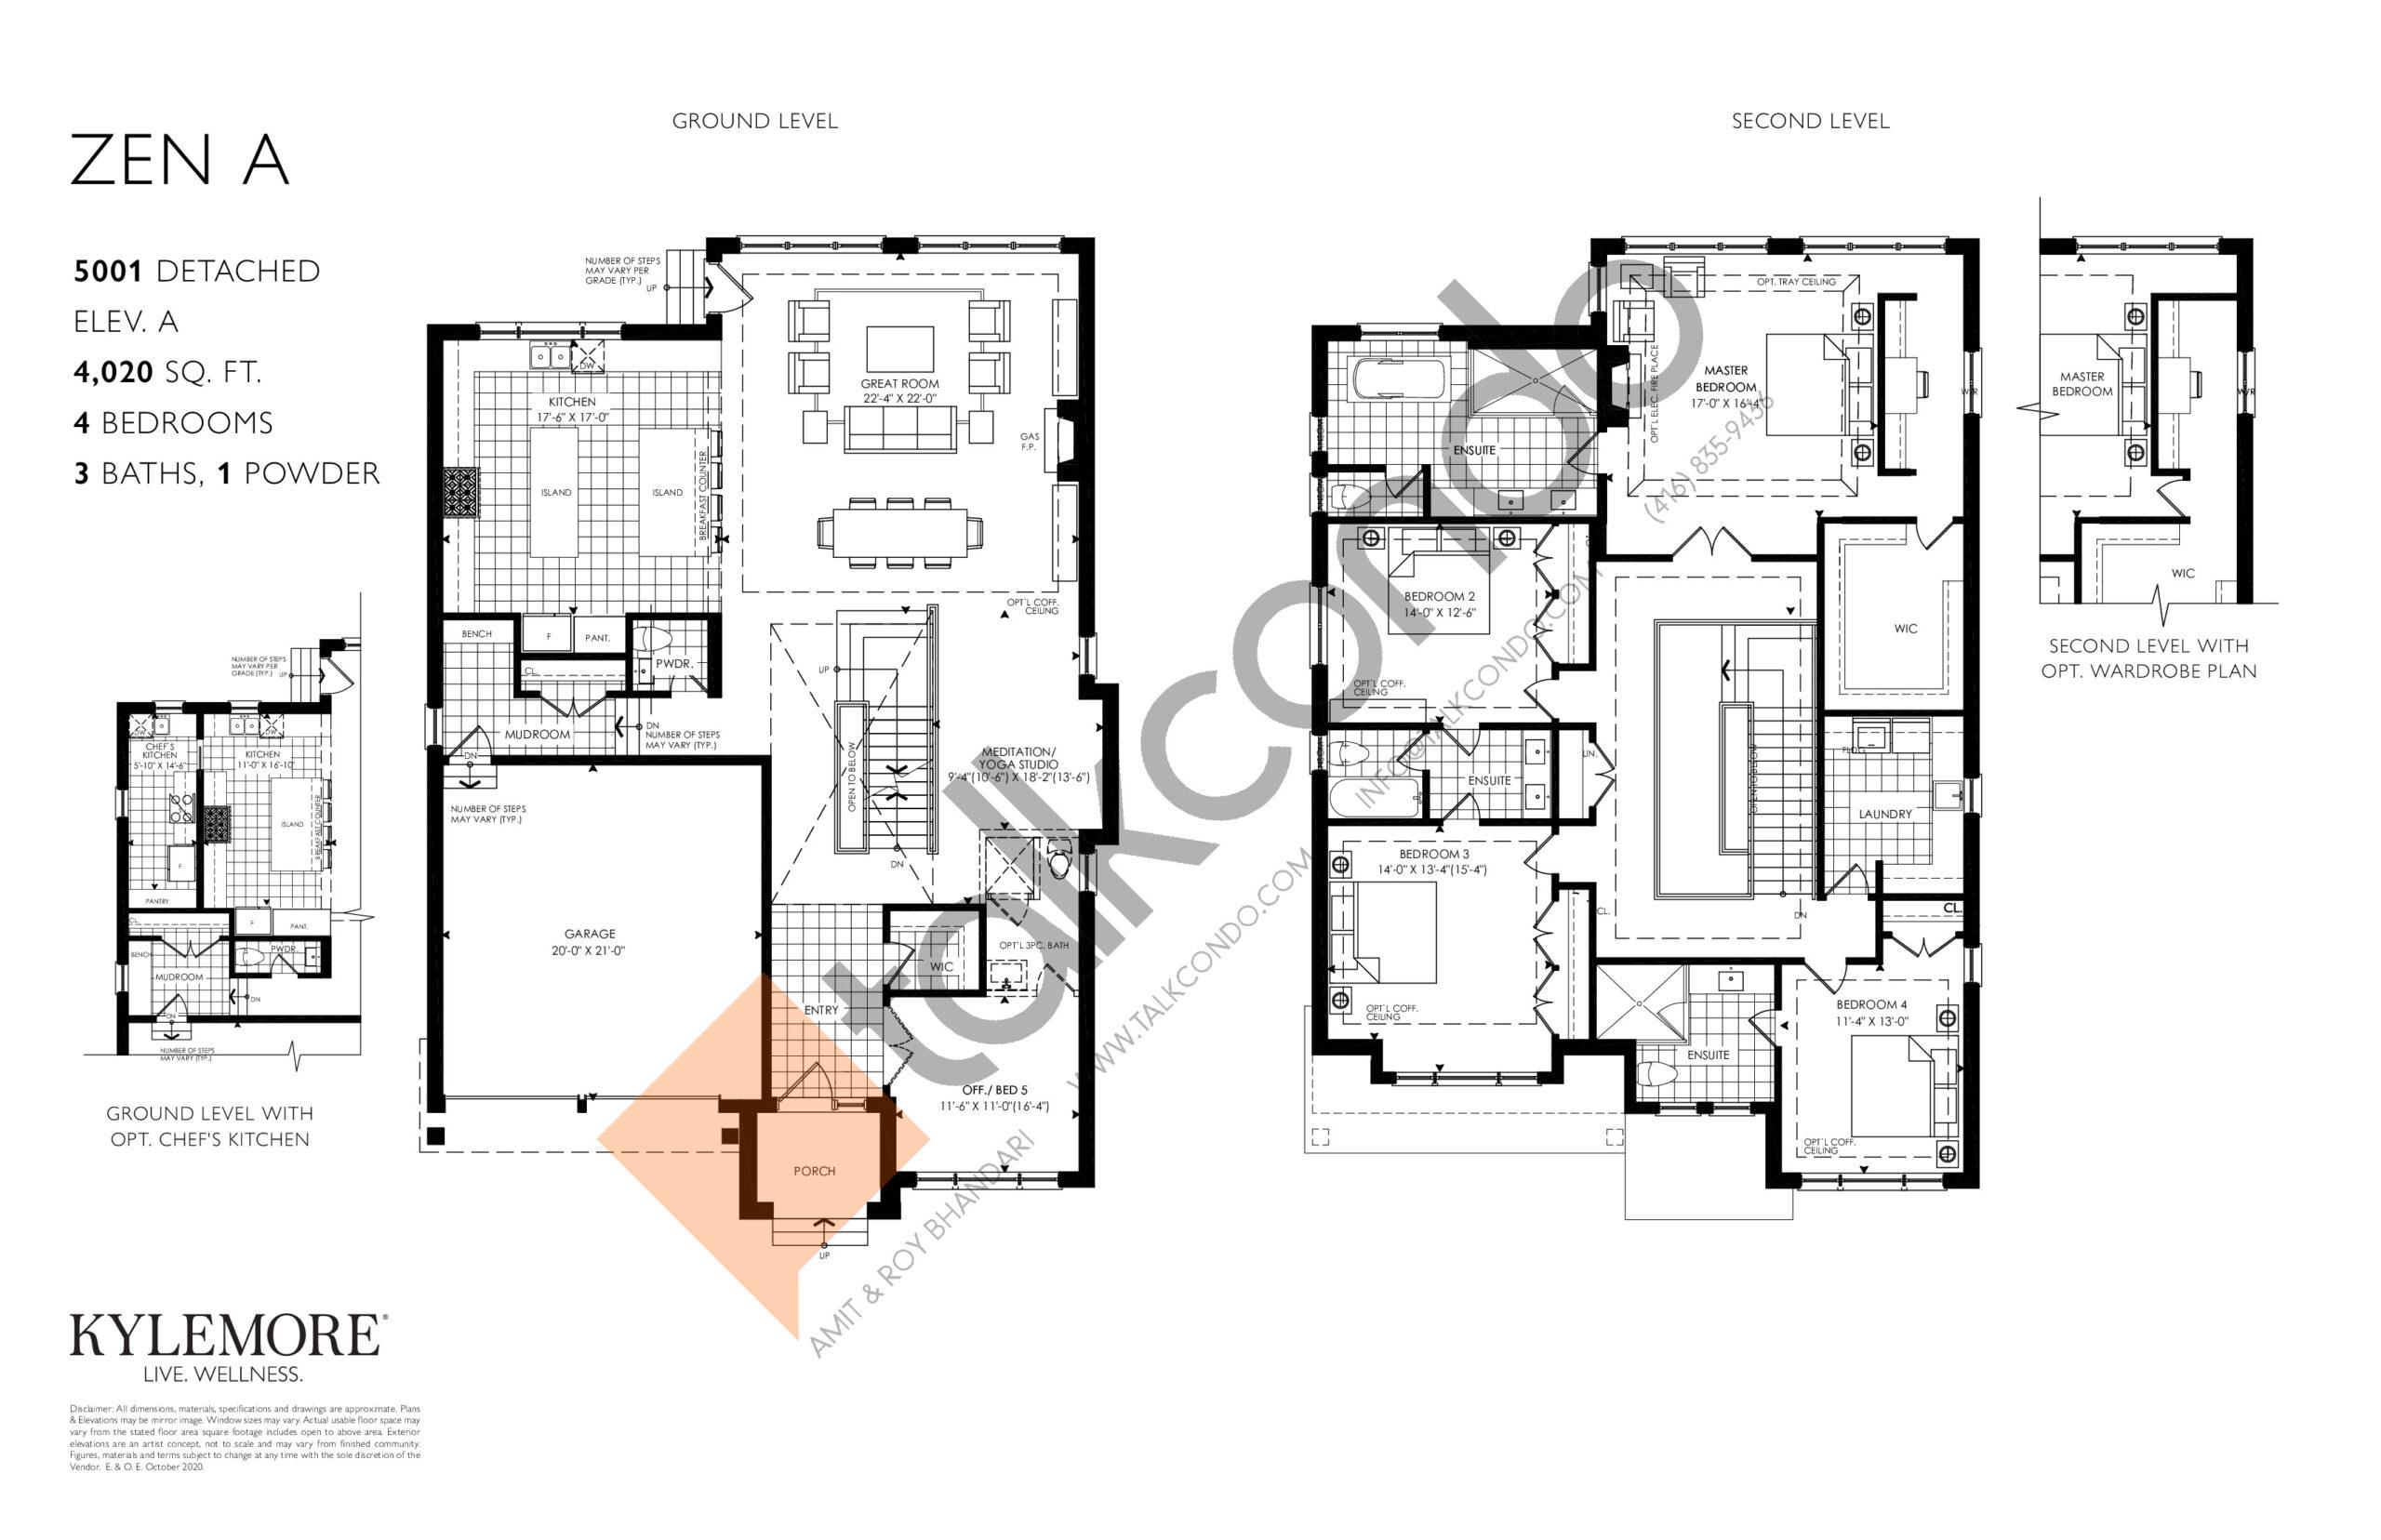 Zen A - Elev. A Floor Plan at Angus Glen South Village - 4020 sq.ft